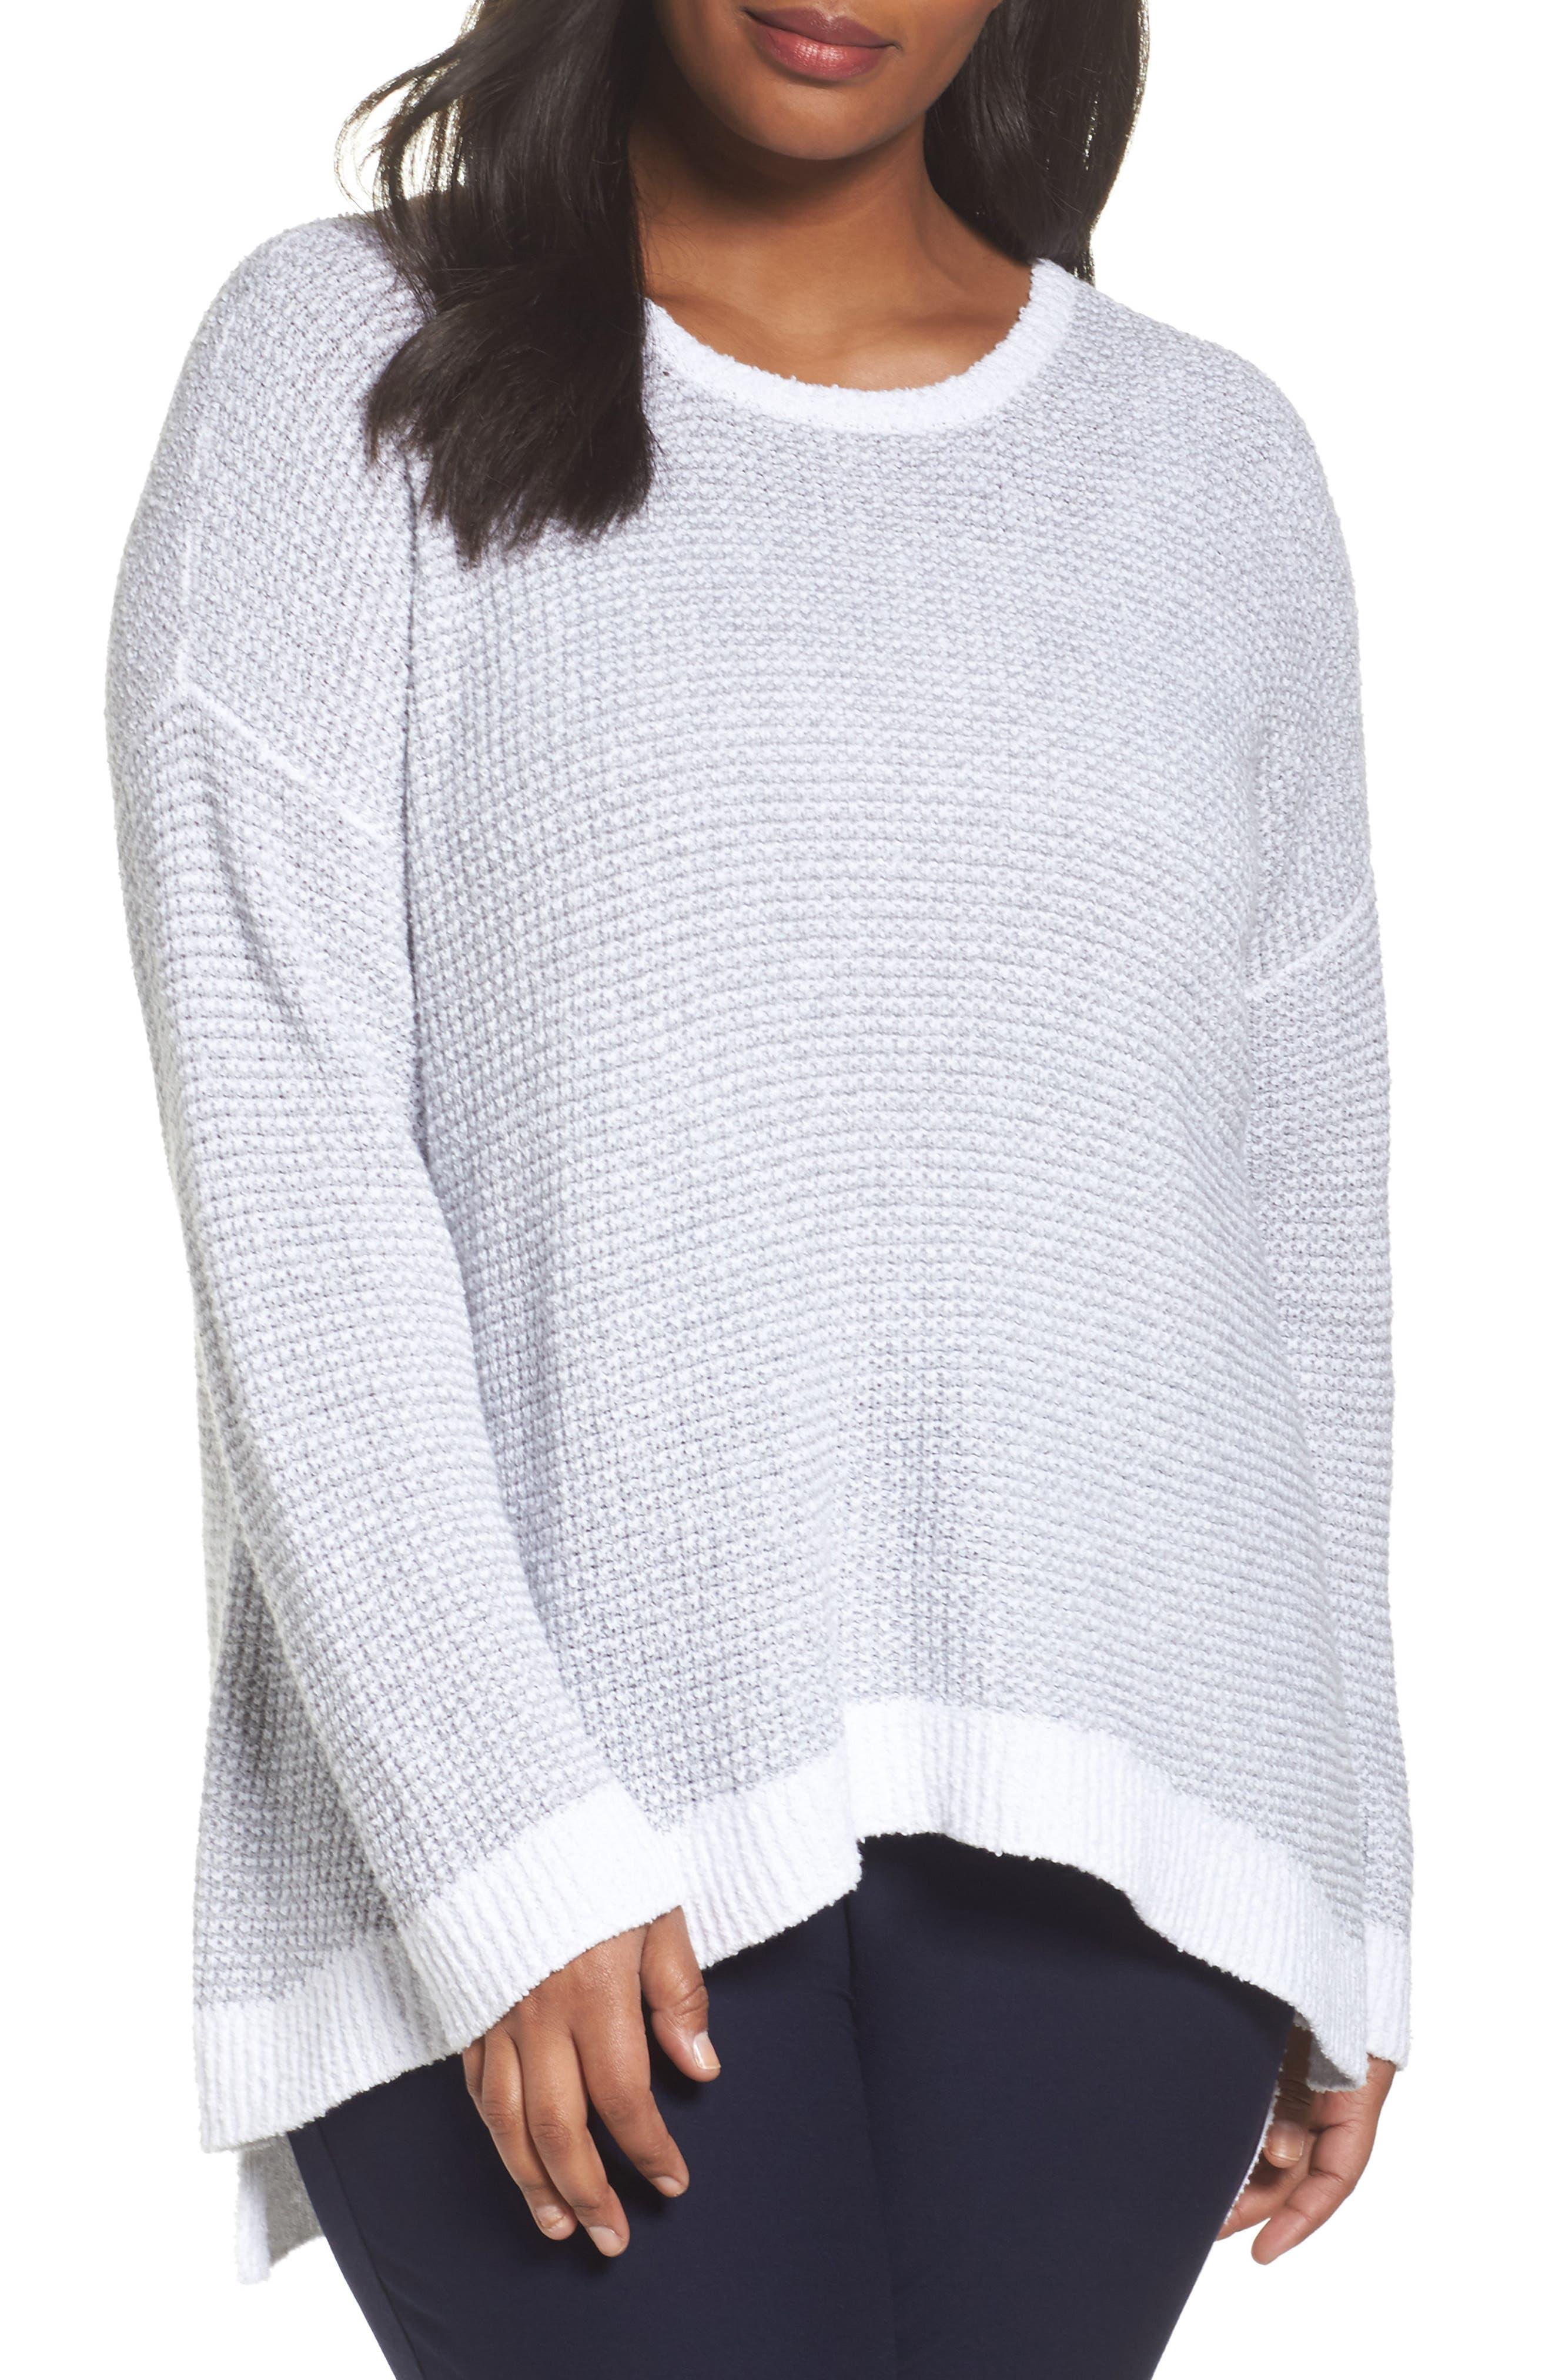 Waffled Organic Cotton Sweater,                             Main thumbnail 1, color,                             Grey